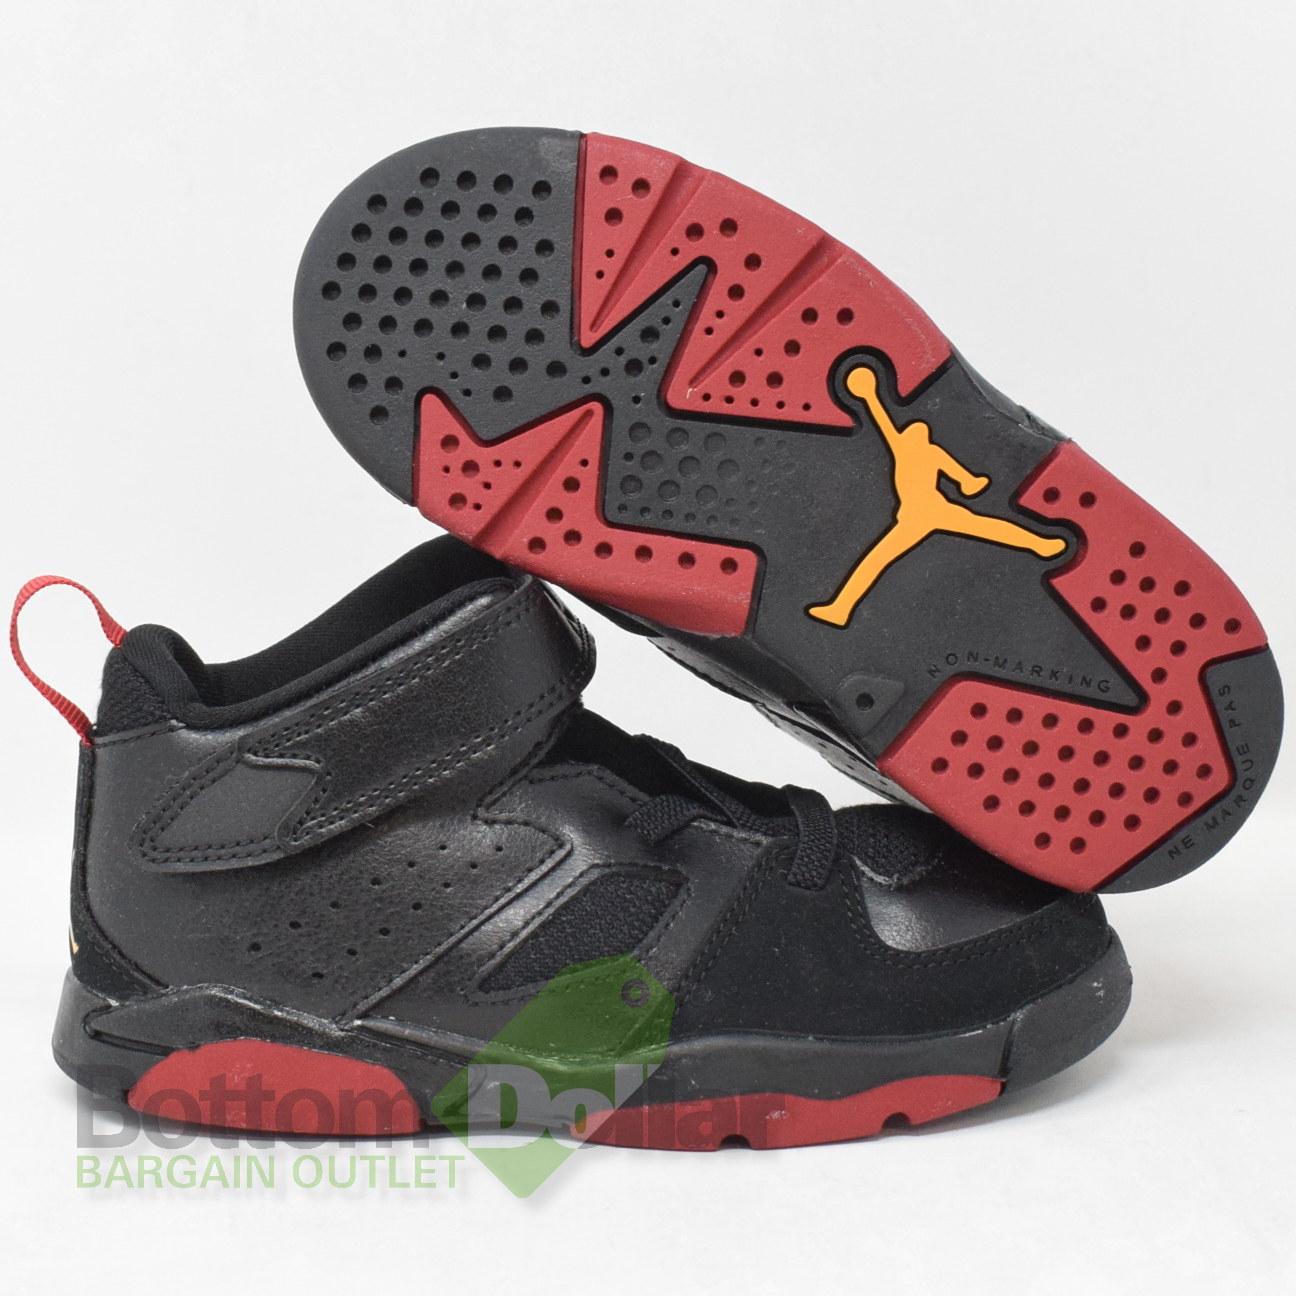 Air Jordan Nike Flight Club 91 Toddler Kids Girls Boys Shoes SNEAKERS 6c 6